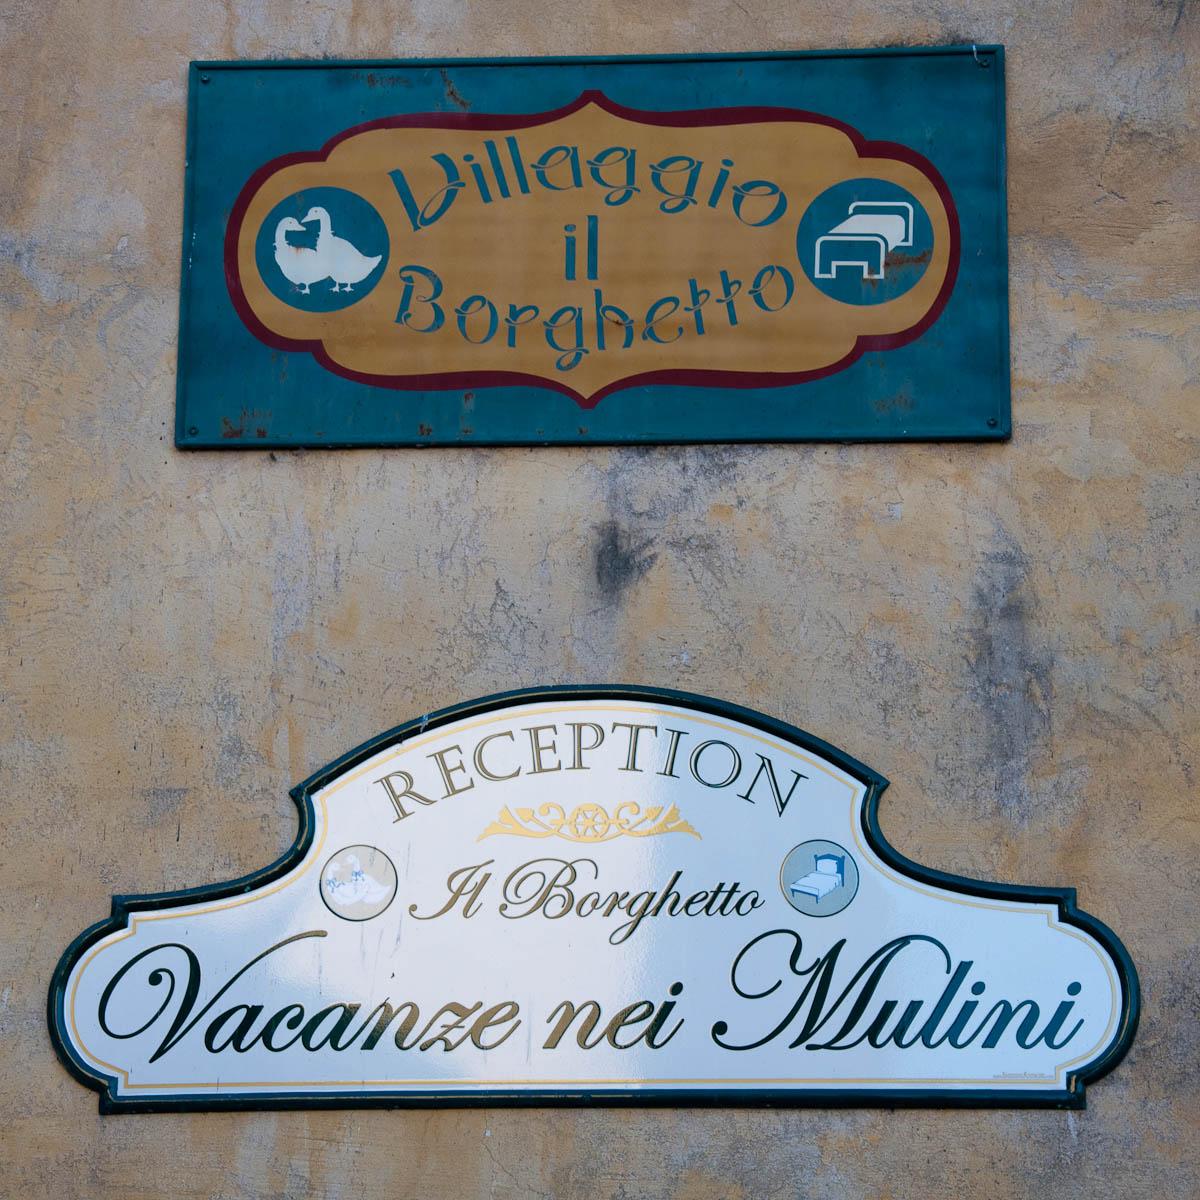 Hotel sign, Borghetto, Veneto, Italy